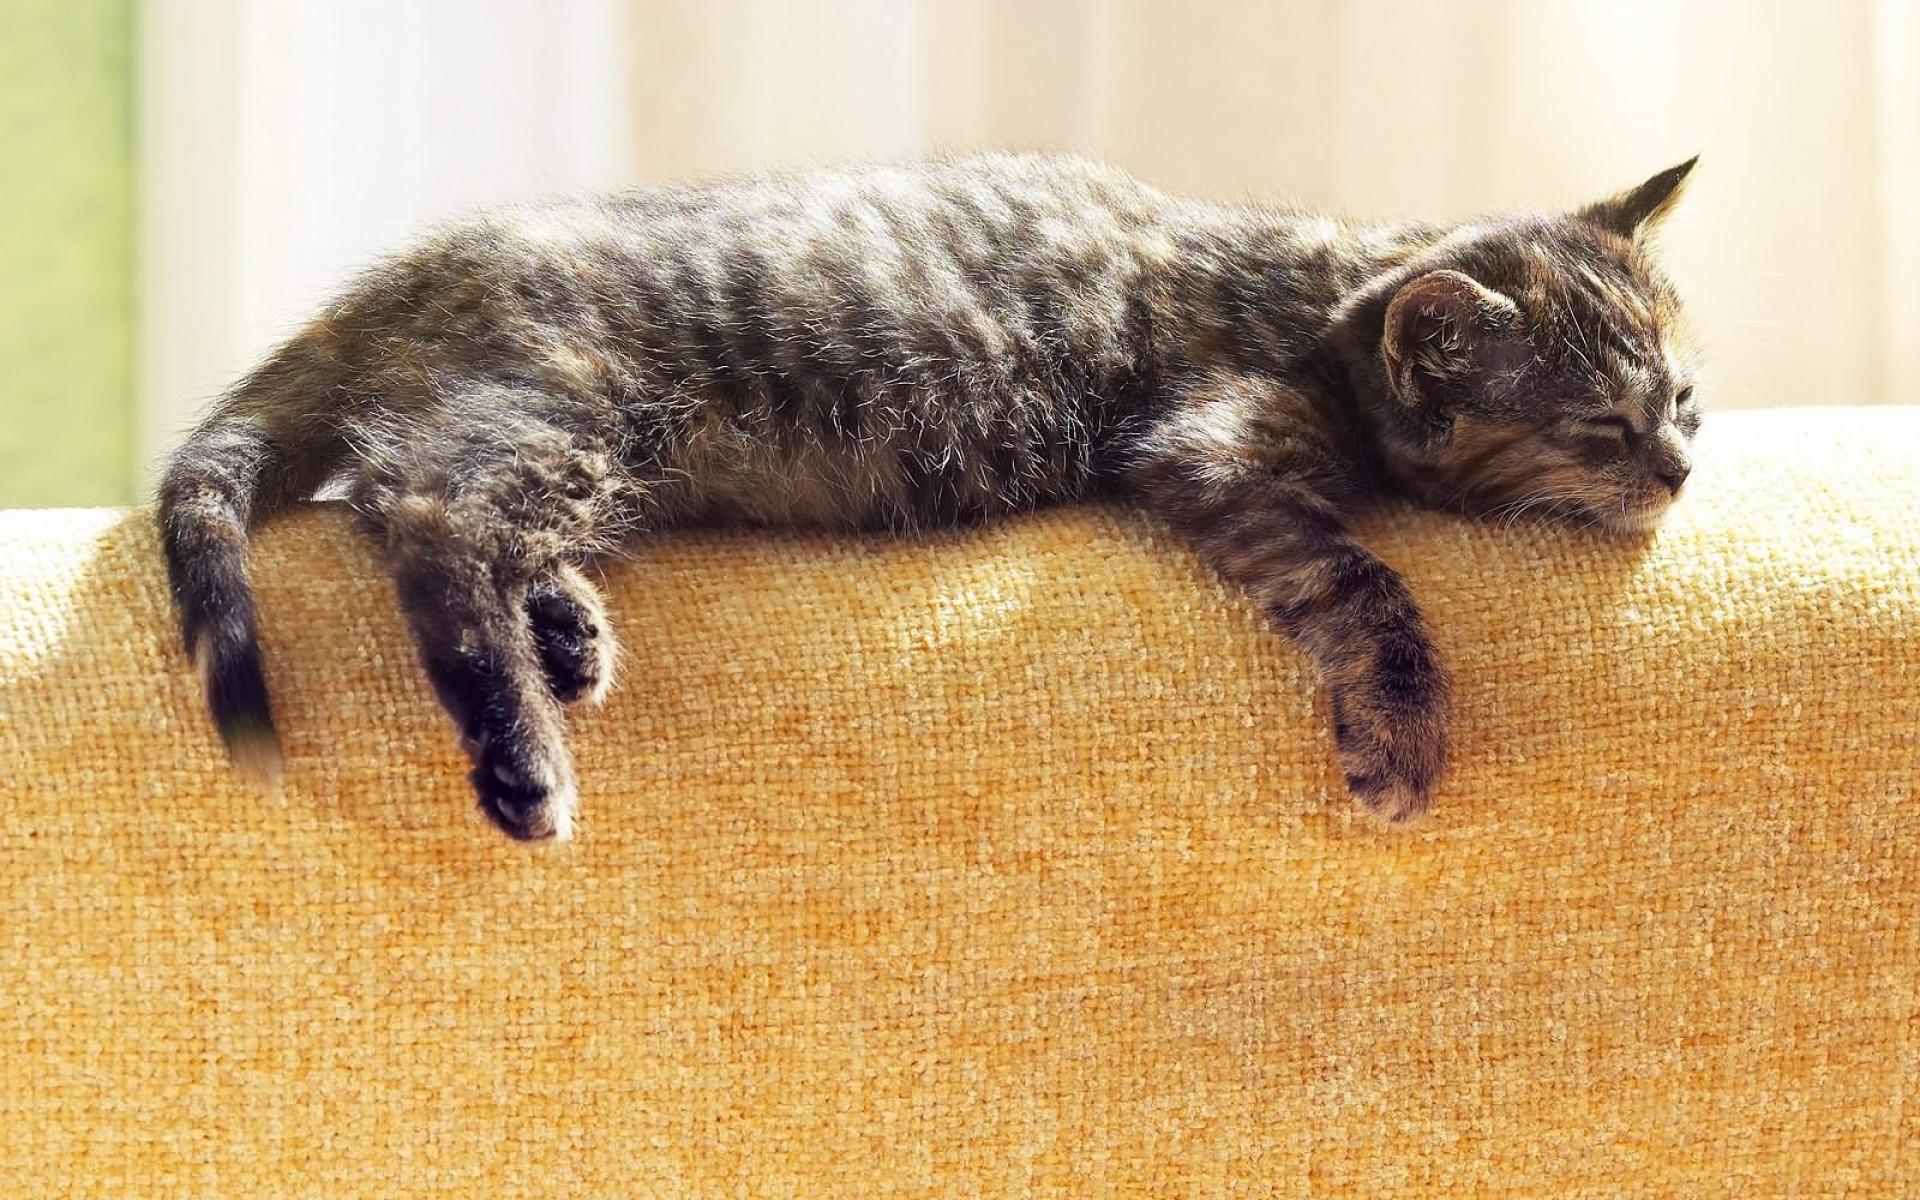 Картинки Кошка, лежа, спящая, табби фото и обои на рабочий стол